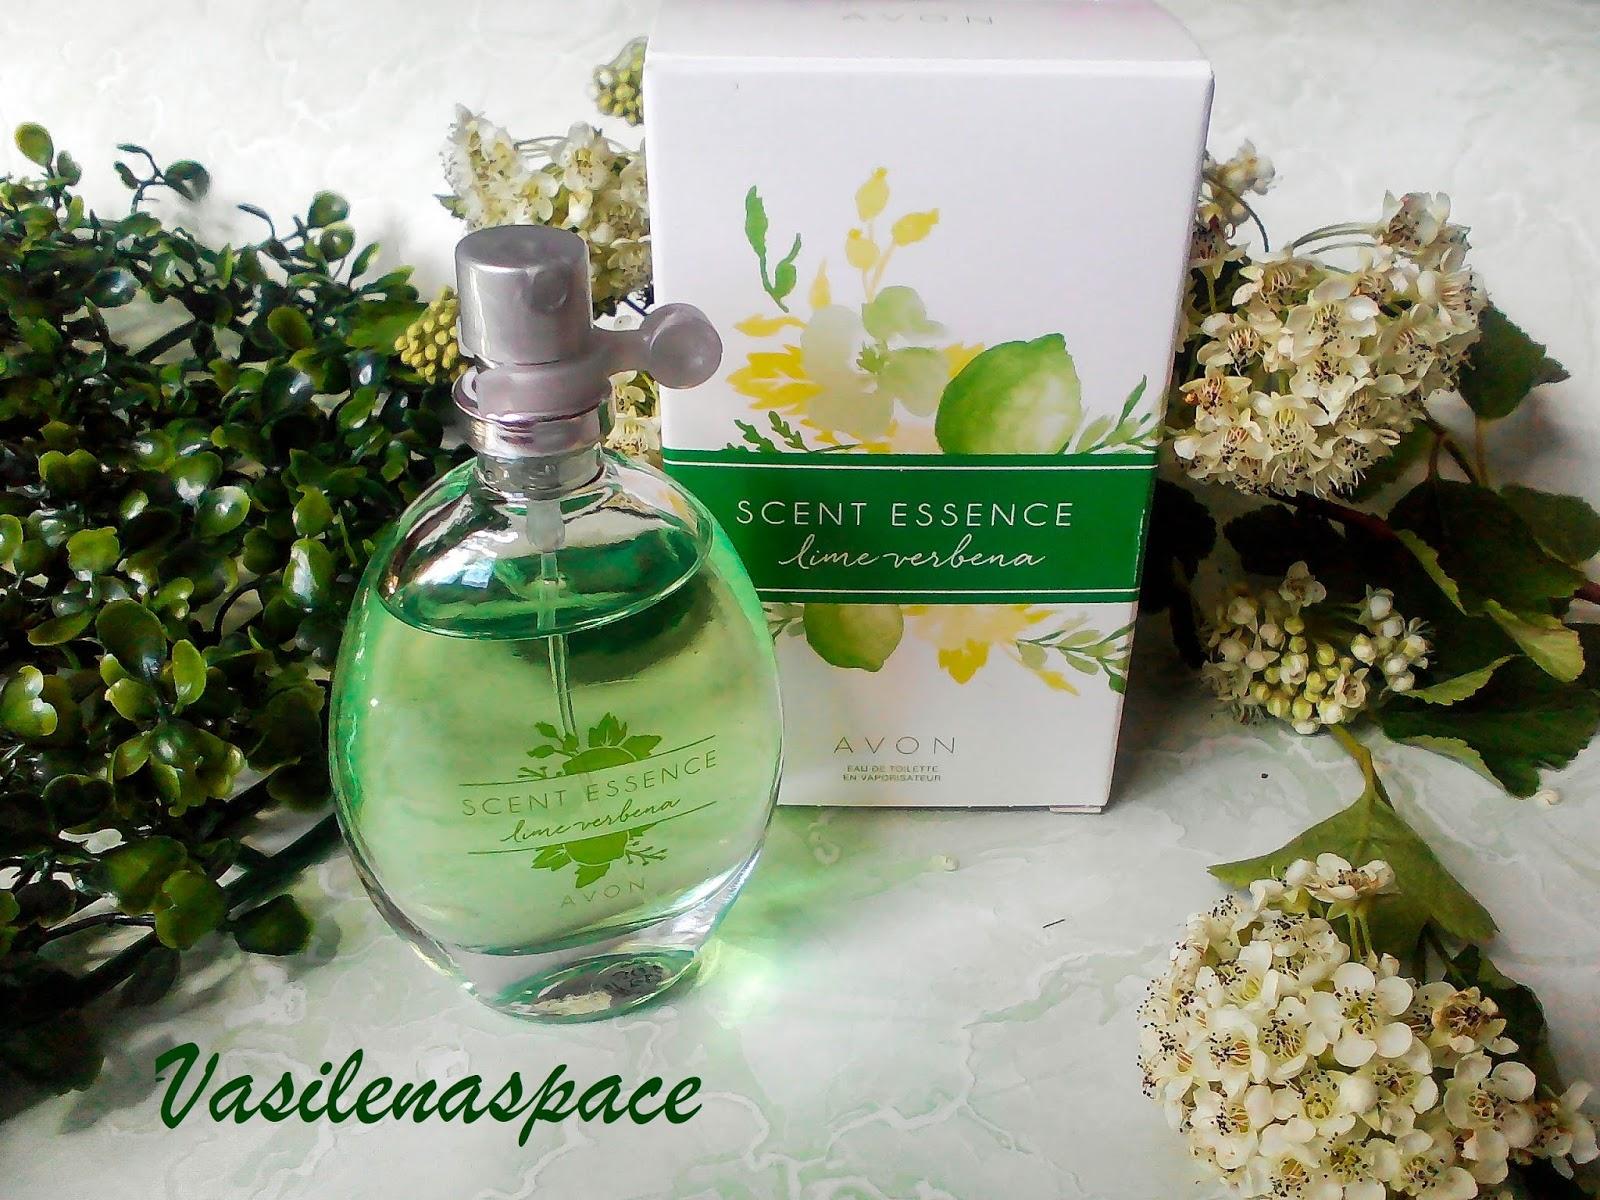 Topnotch Освежающий лимонад - Avon Scent Essence Lime Verbena. PL13